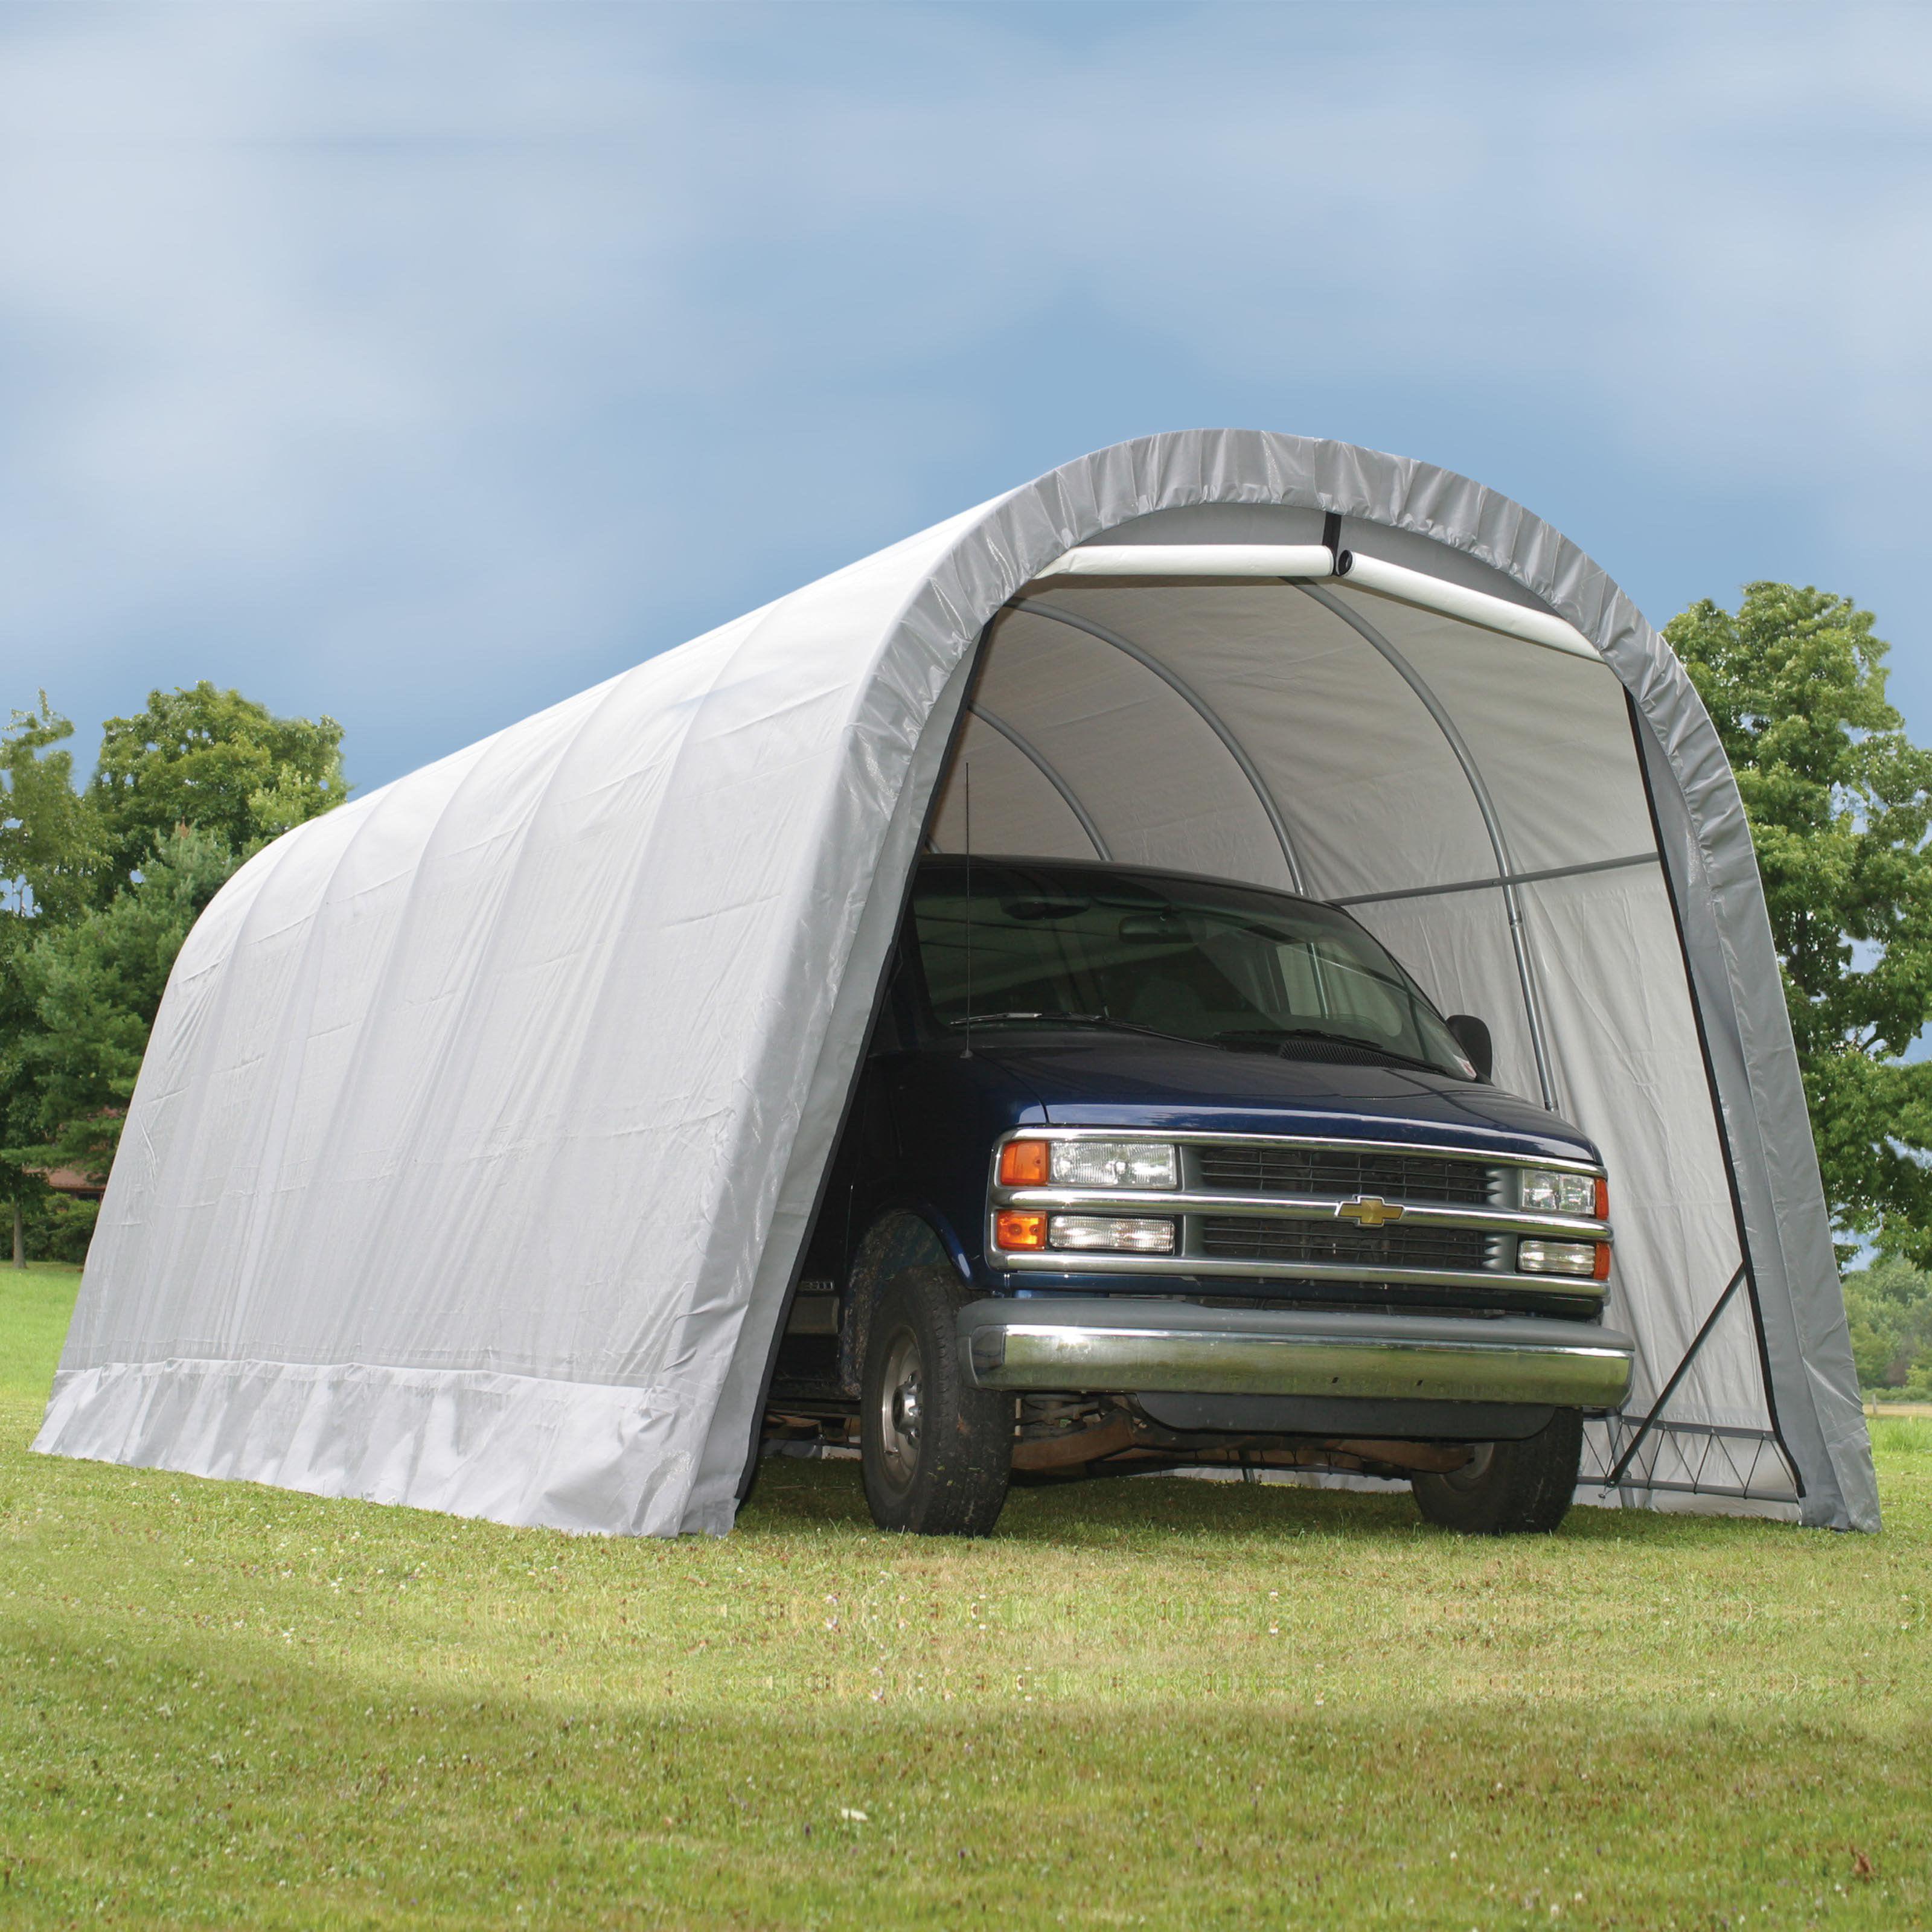 SUV/Boat Canopy Carport - Walmart.com & ShelterLogic 12 x 24 ft. SUV/Boat Canopy Carport - Walmart.com